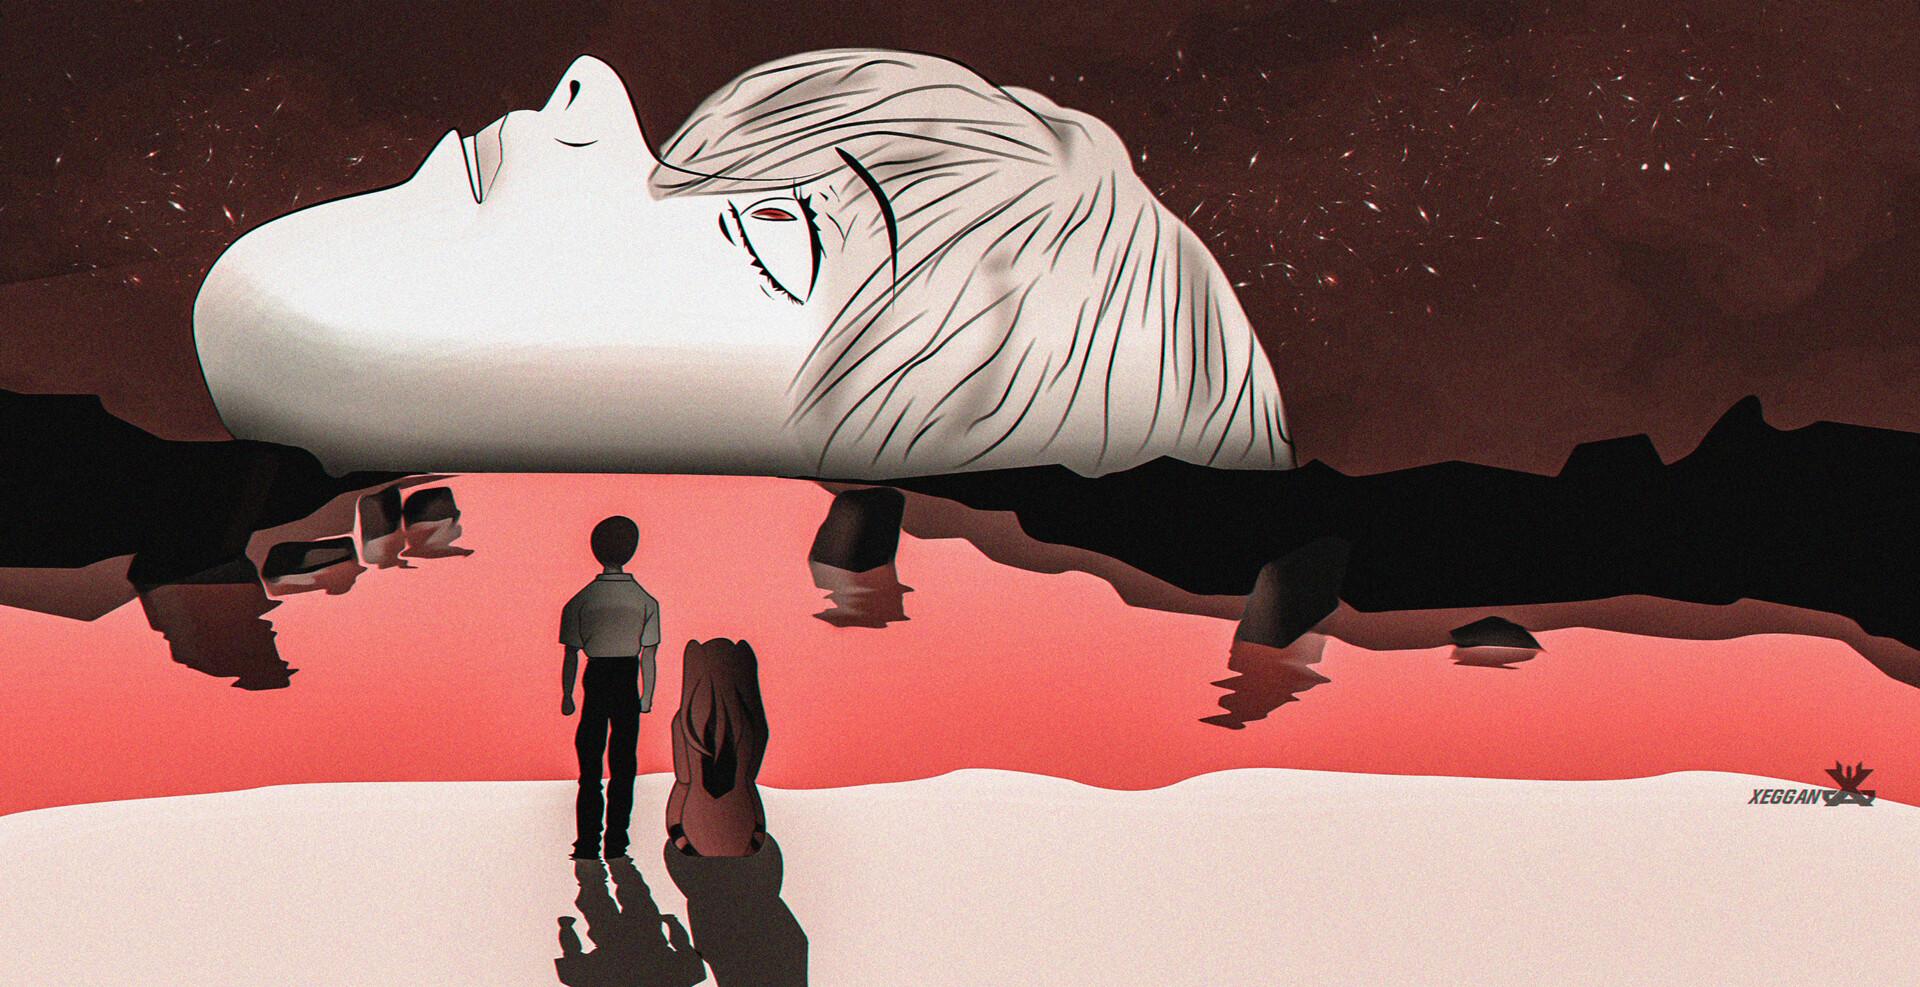 Danil Xeggan - Neon Genesis Evangelion: The End of Evangelion